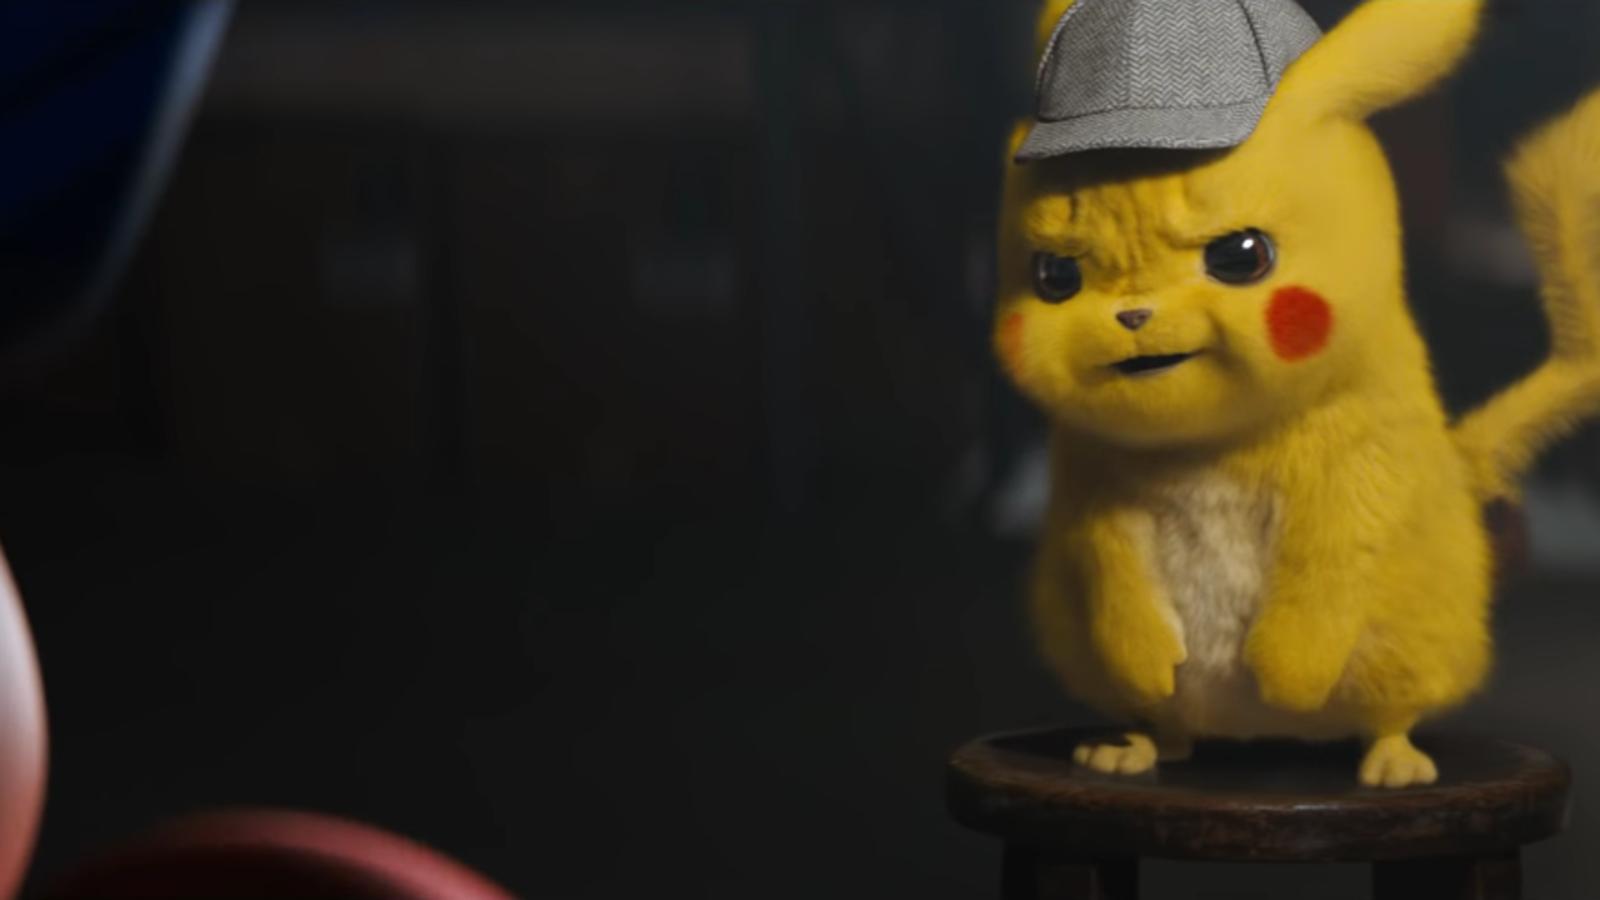 Gruff Looking Detective Pikachu Cute Pikachu Pikachu Art Pikachu